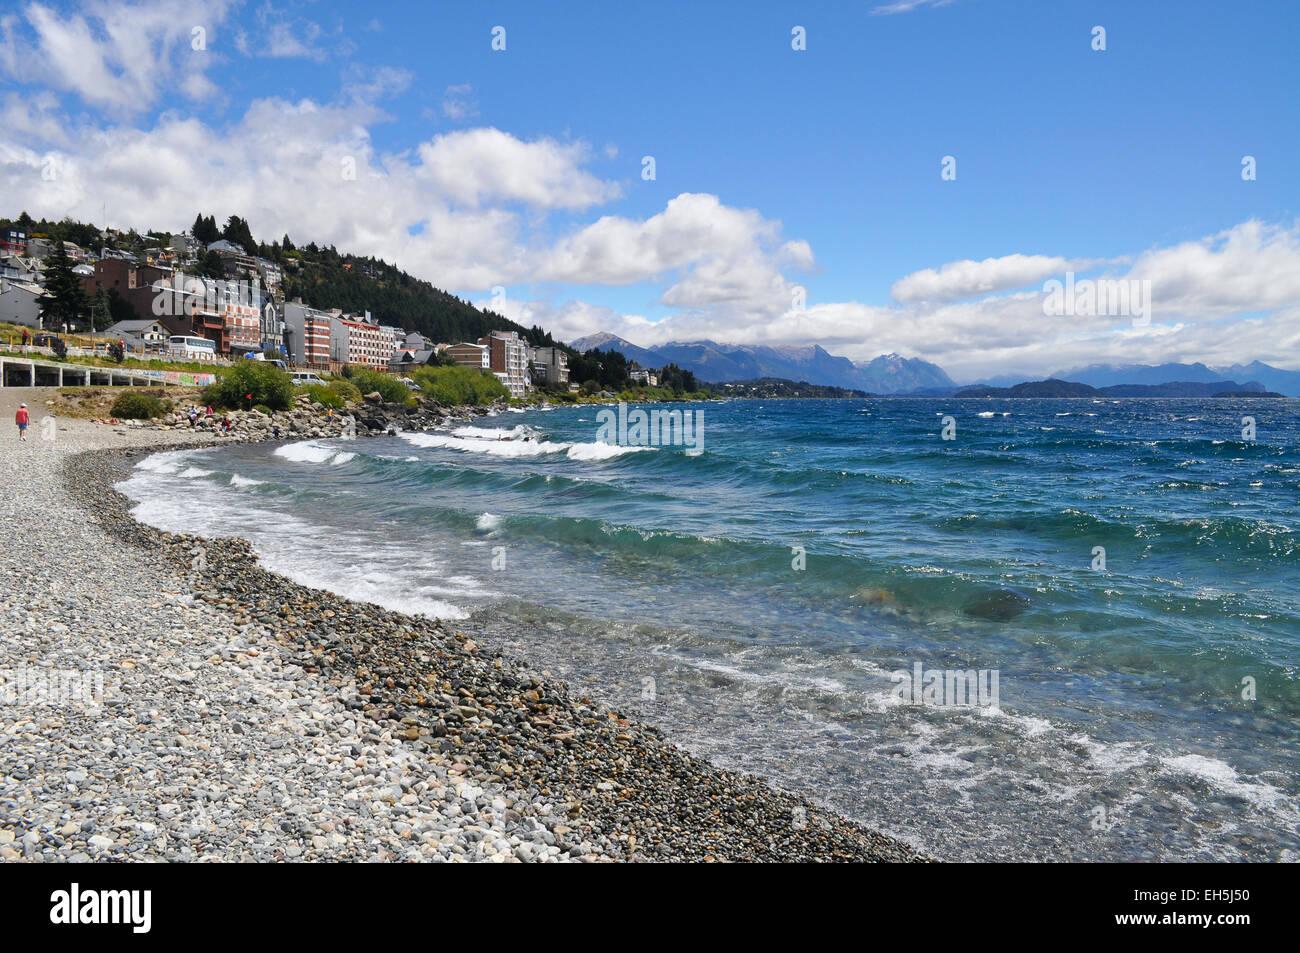 Lake Nahuel Huapi. San Carlos de Bariloche. Argentina. - Stock Image